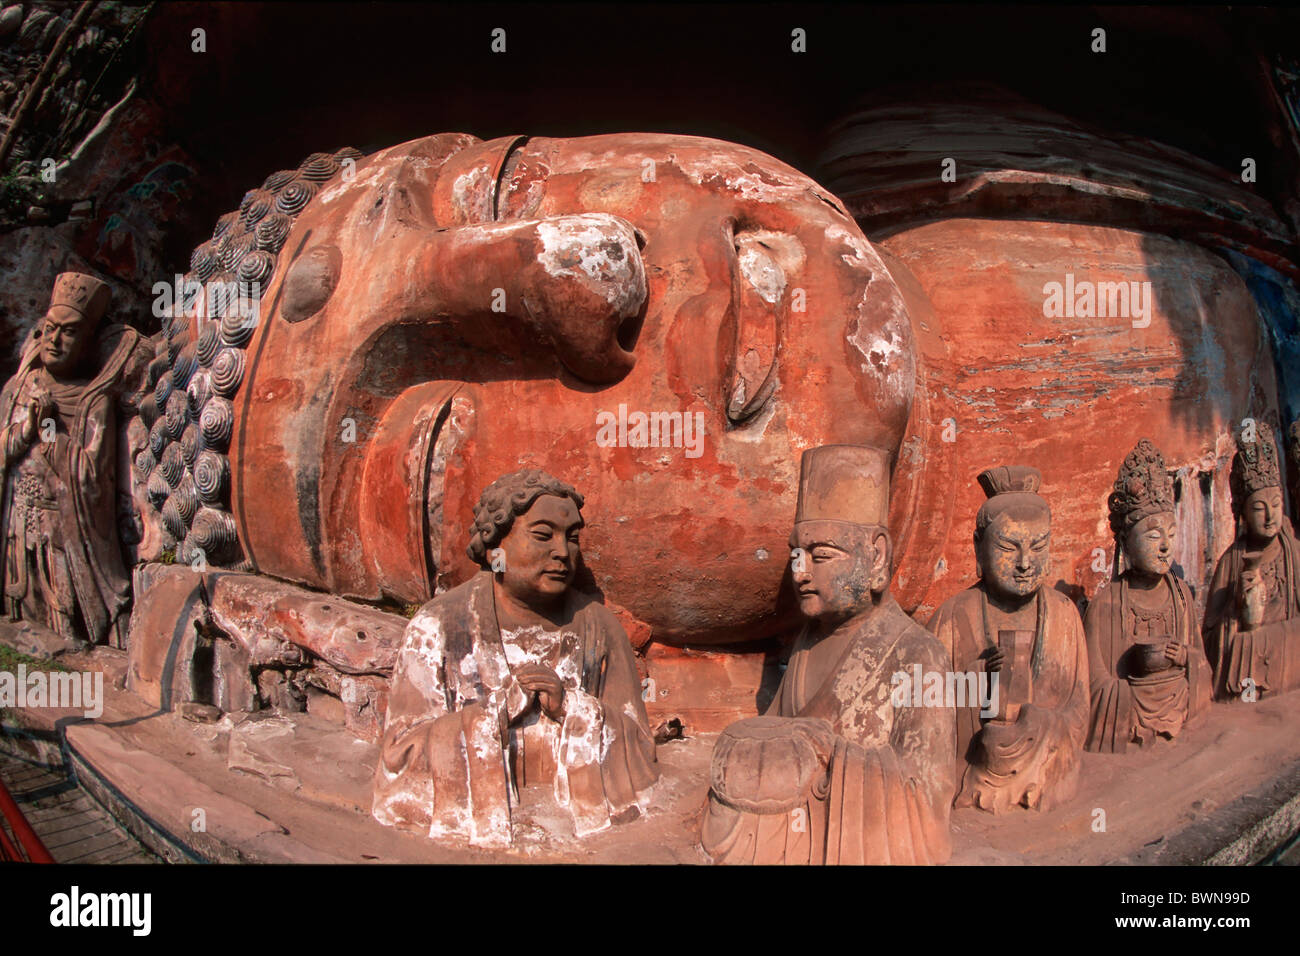 China Asia Cave Nr. 11 Buddha Sakyamuni Entering Nirvana Dazu Rock Carvings sculptures Tang Dynasty Baodingshan - Stock Image